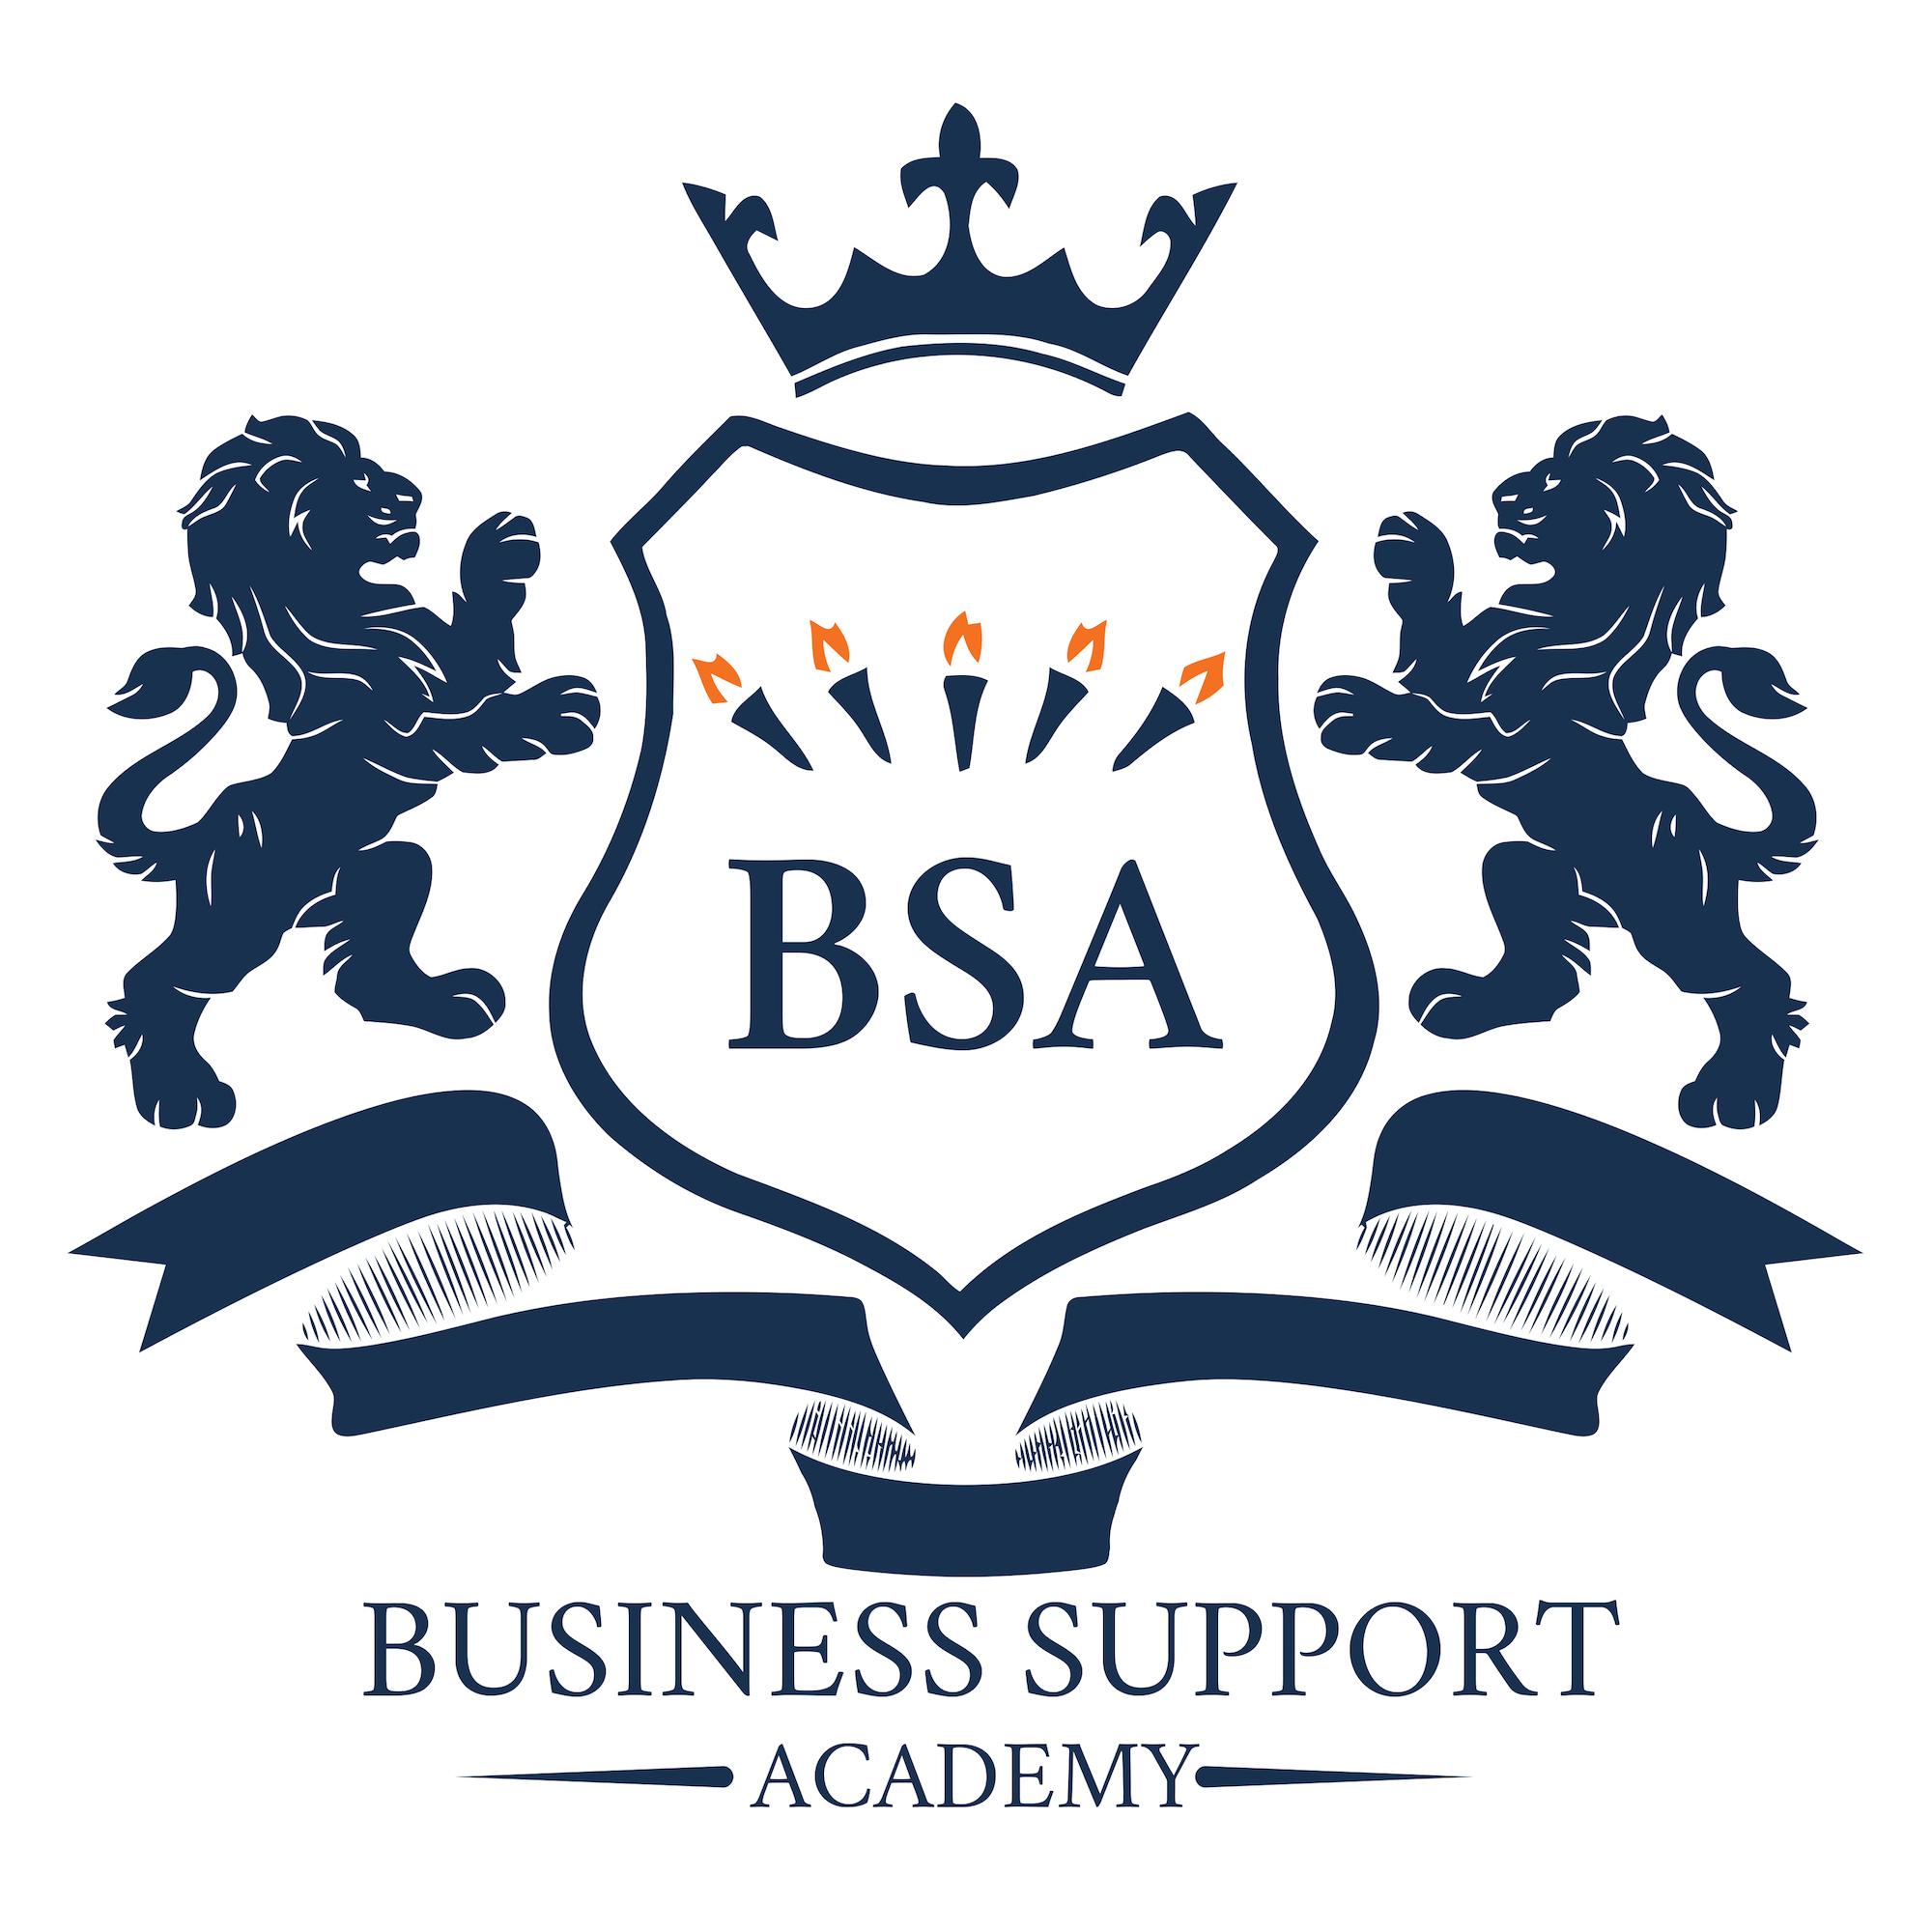 Logo we designed for The BSA